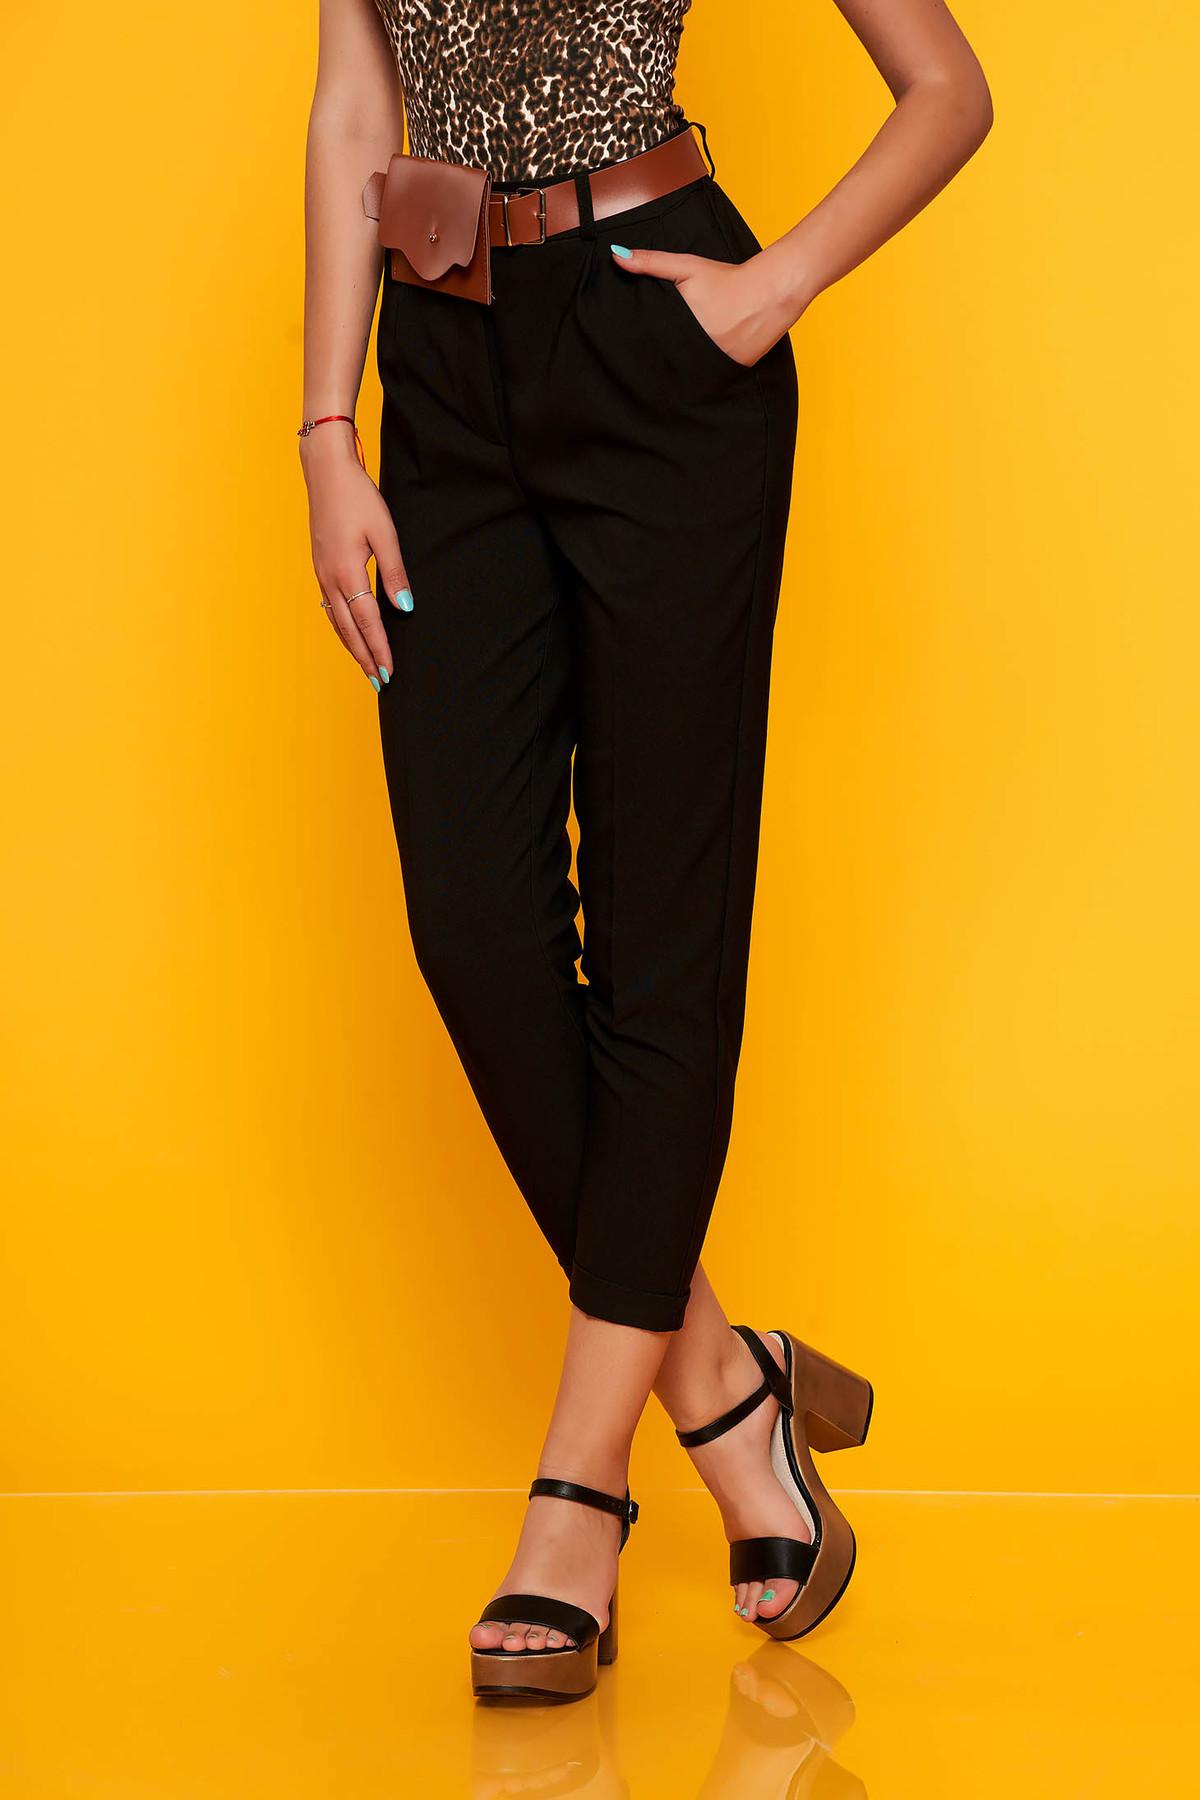 Pantaloni SunShine negri casual cu un croi drept cu talie medie cu buzunare si accesoriu tip curea